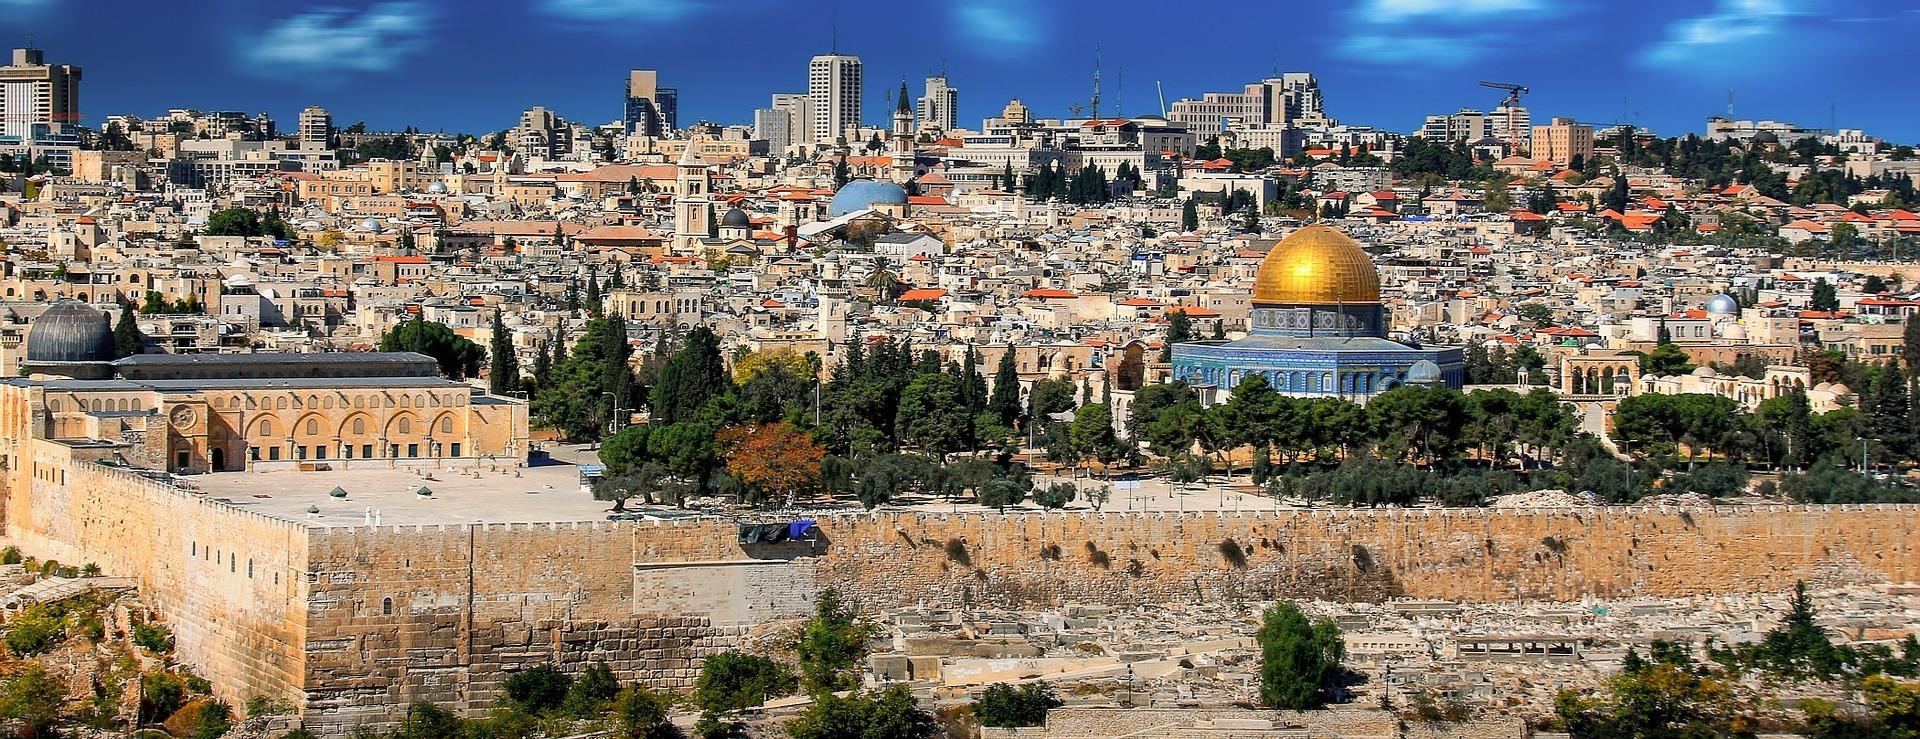 10 Best Egypt, Jordan And Israel Tours & Trips 2019/2020